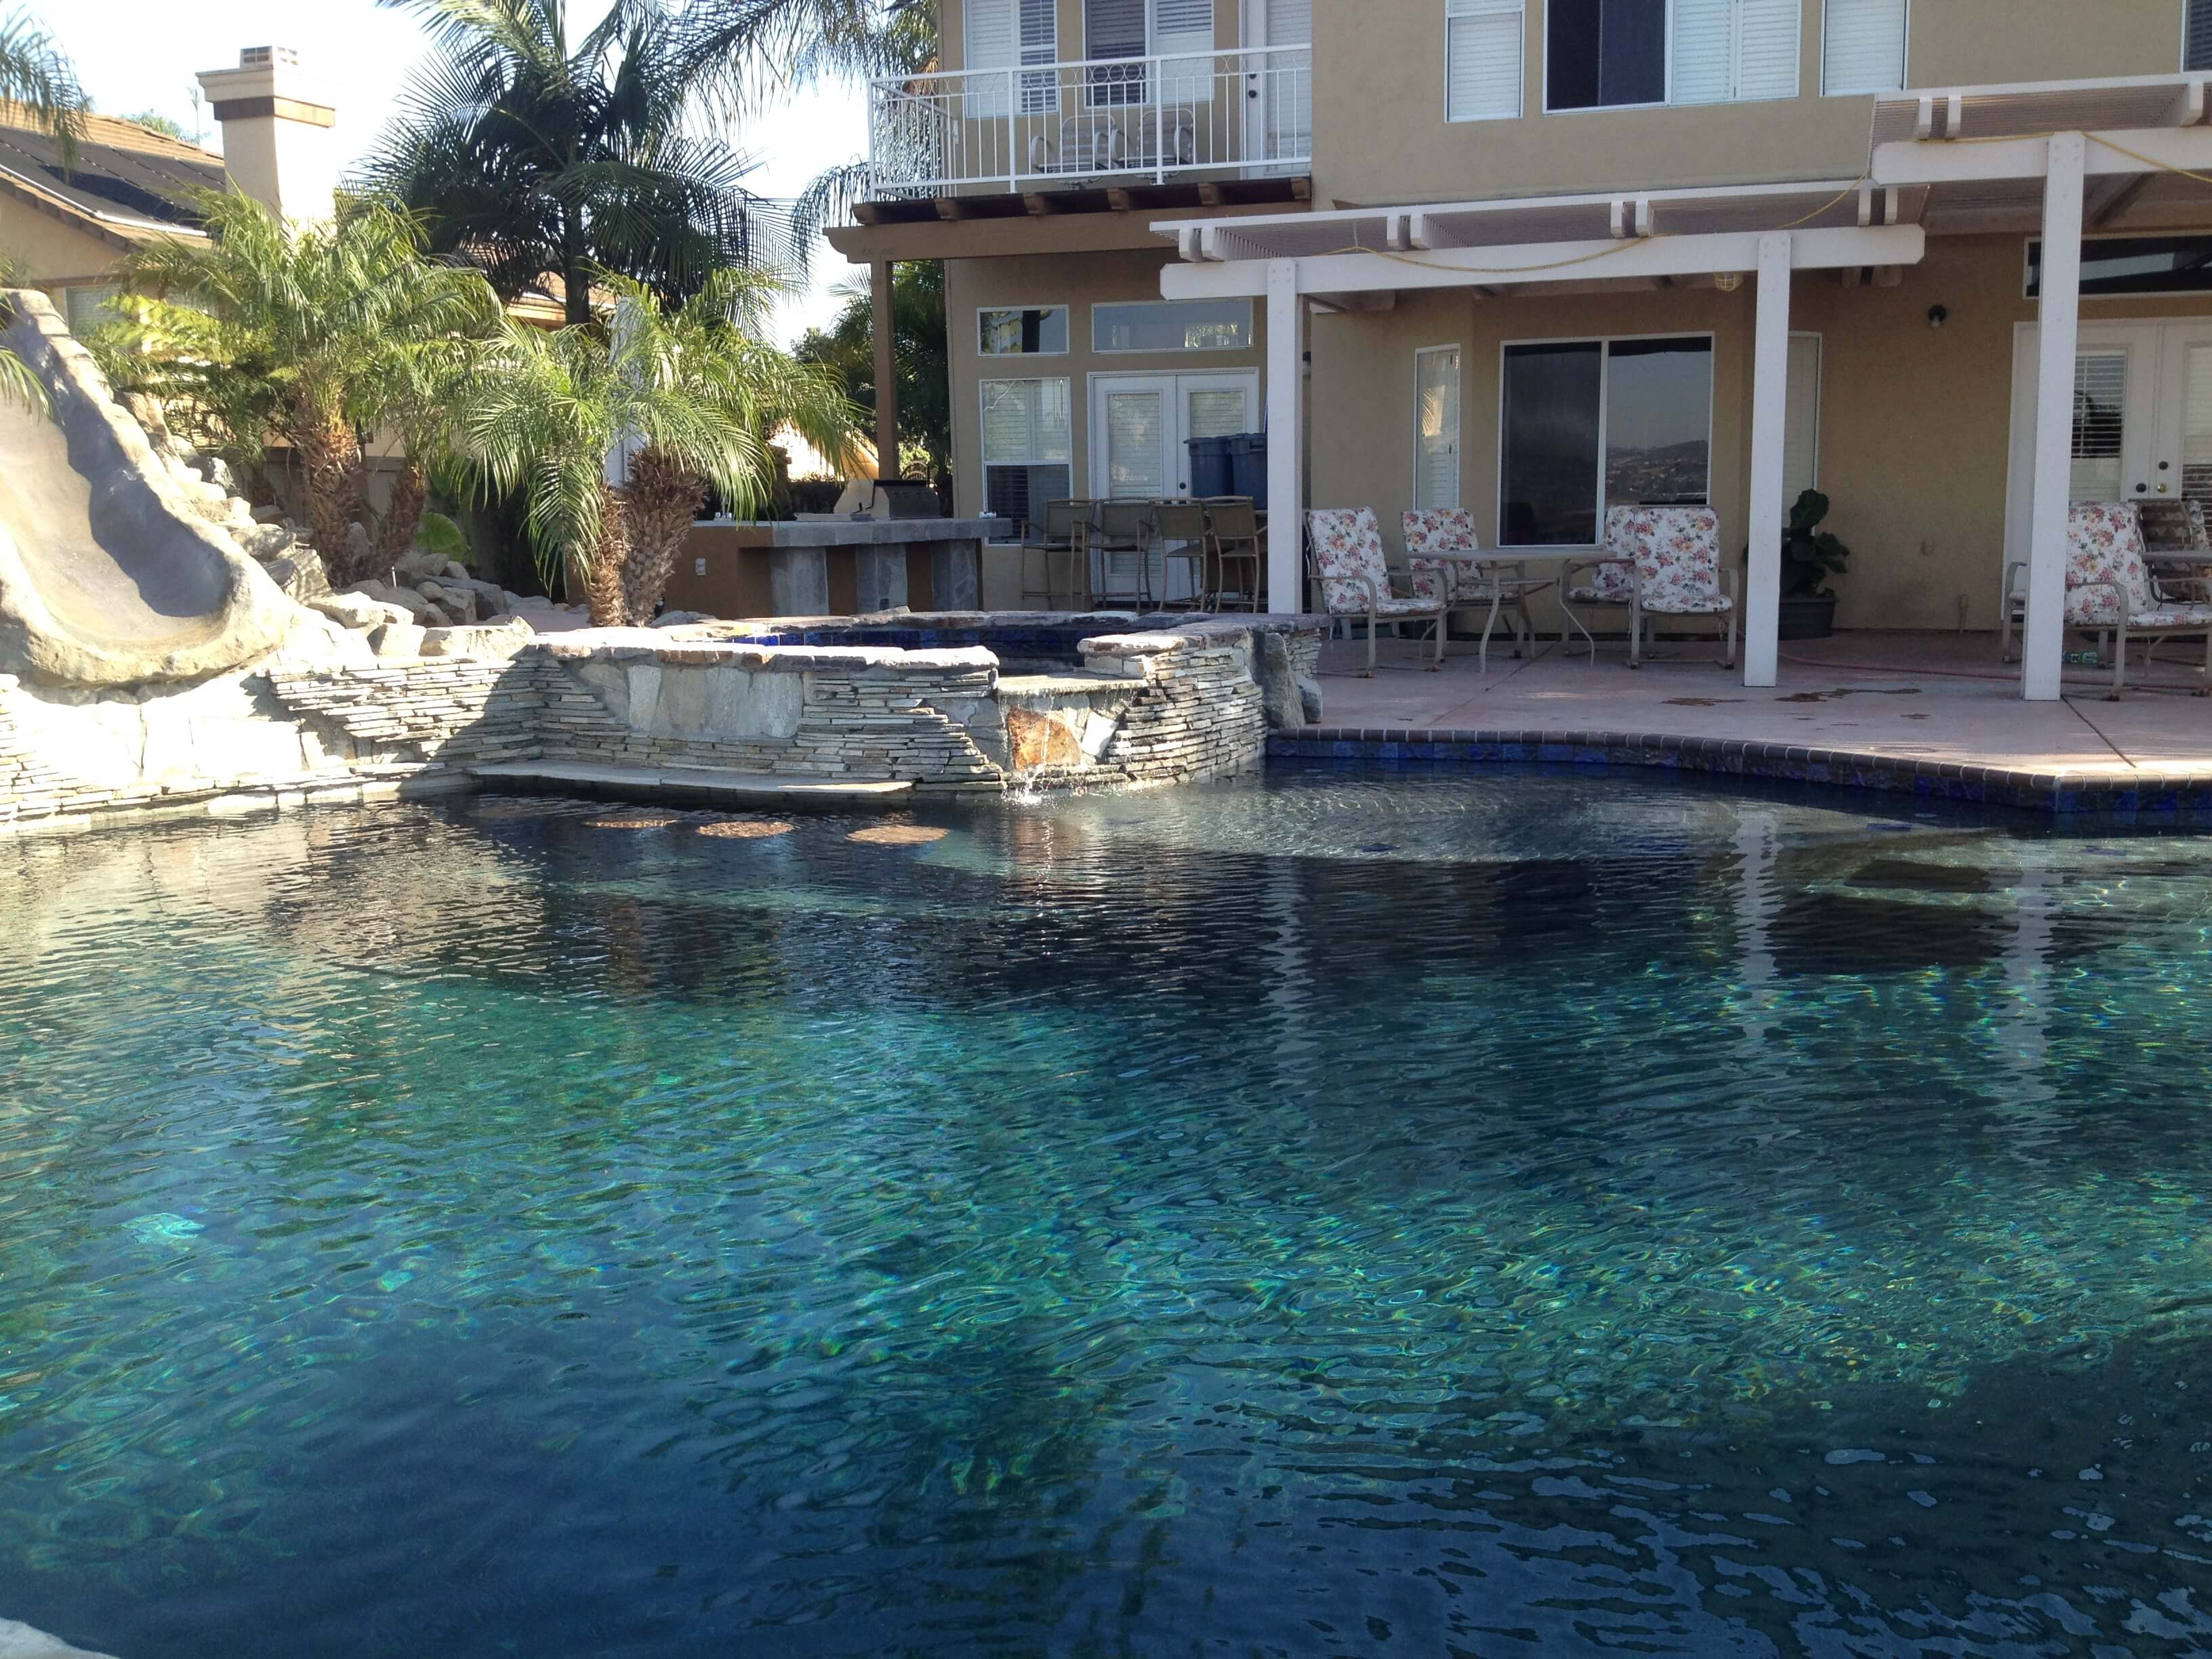 Gammon Pools, San Diego Pool Renovation Company, New Web Presence